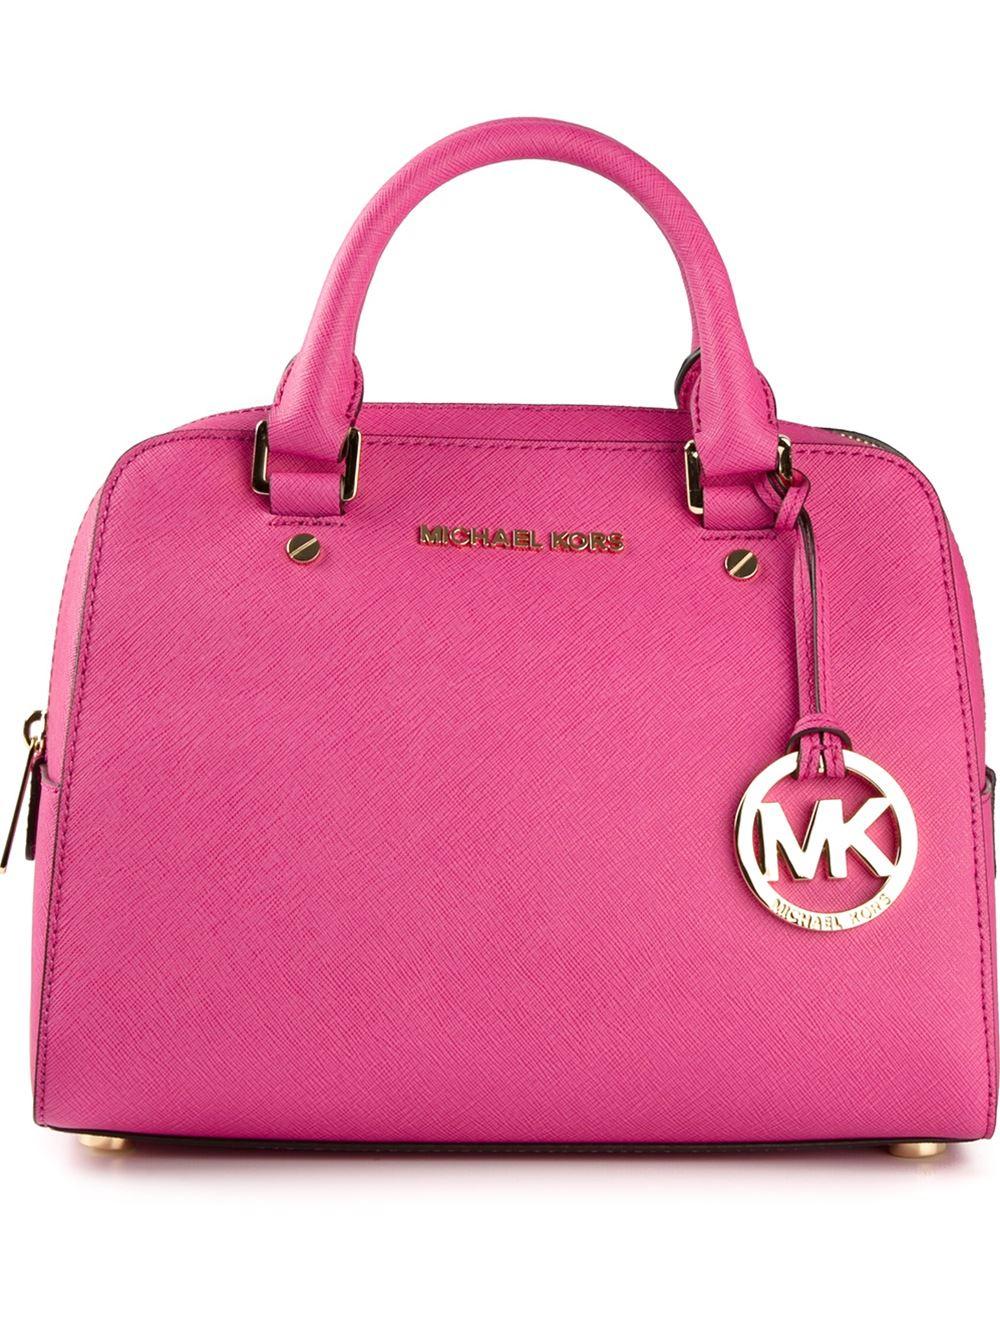 Lyst Michael Kors Jet Set Travel Satchel In Pink Mercer Authentic Gallery